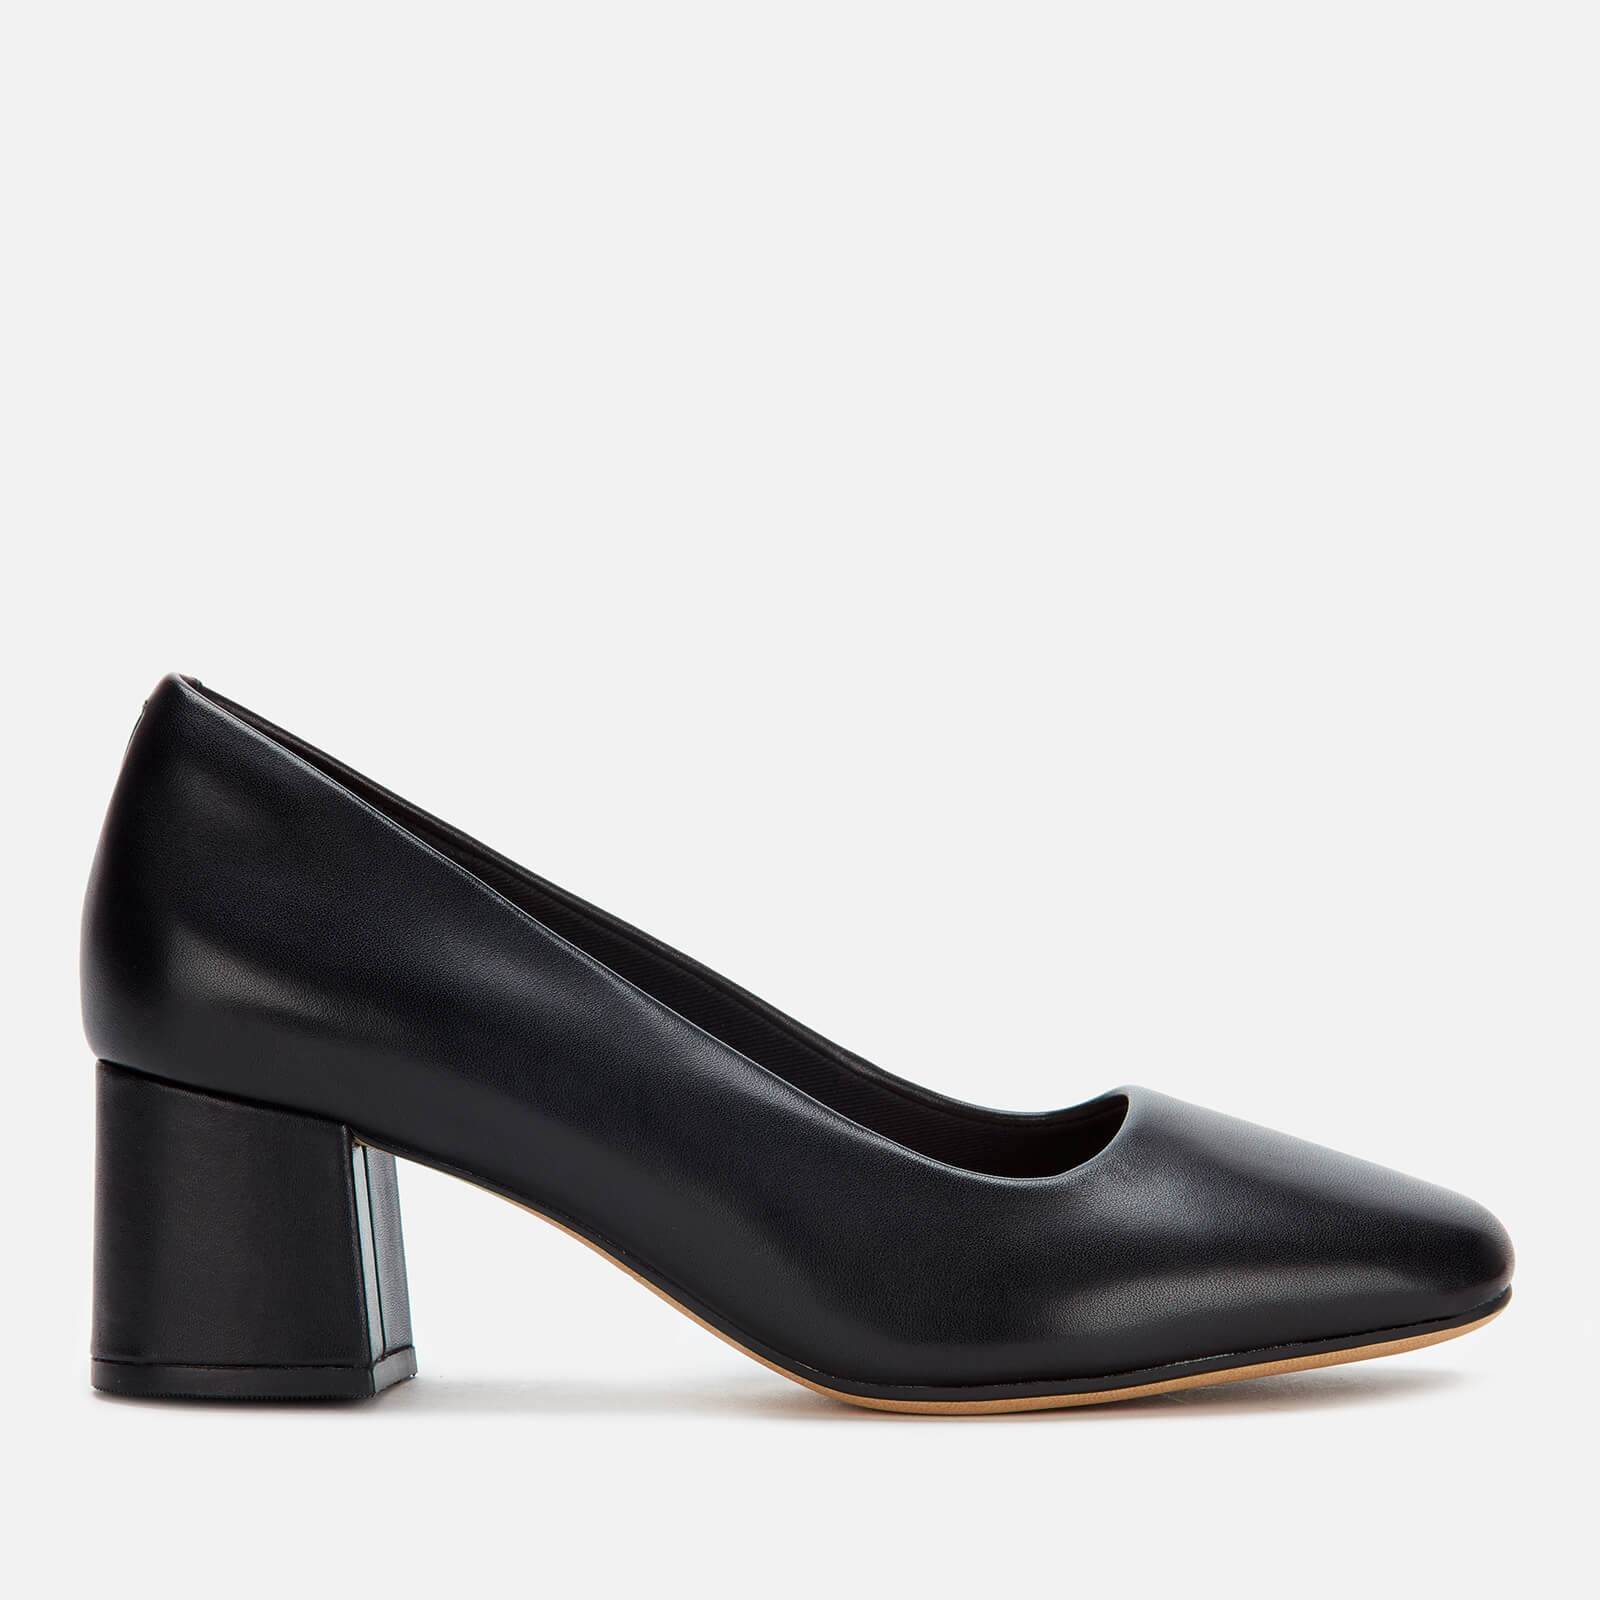 Clarks Women's Sheer Rose Leather Block Heeled Shoes - Black - UK 5